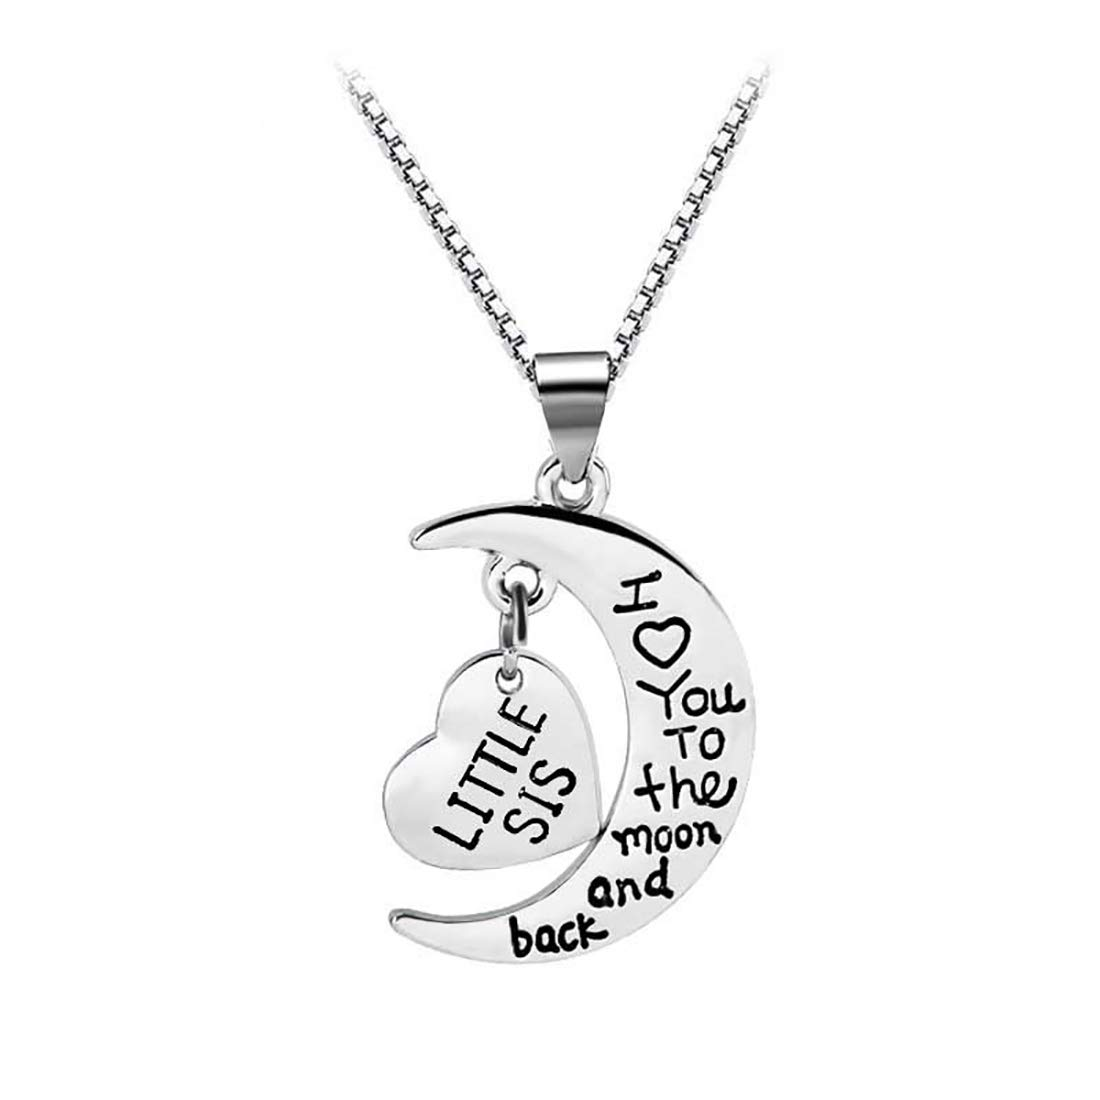 HOFOYA 3 Piece Suit Family Set Silver Love Heart Necklace Set for Sisters